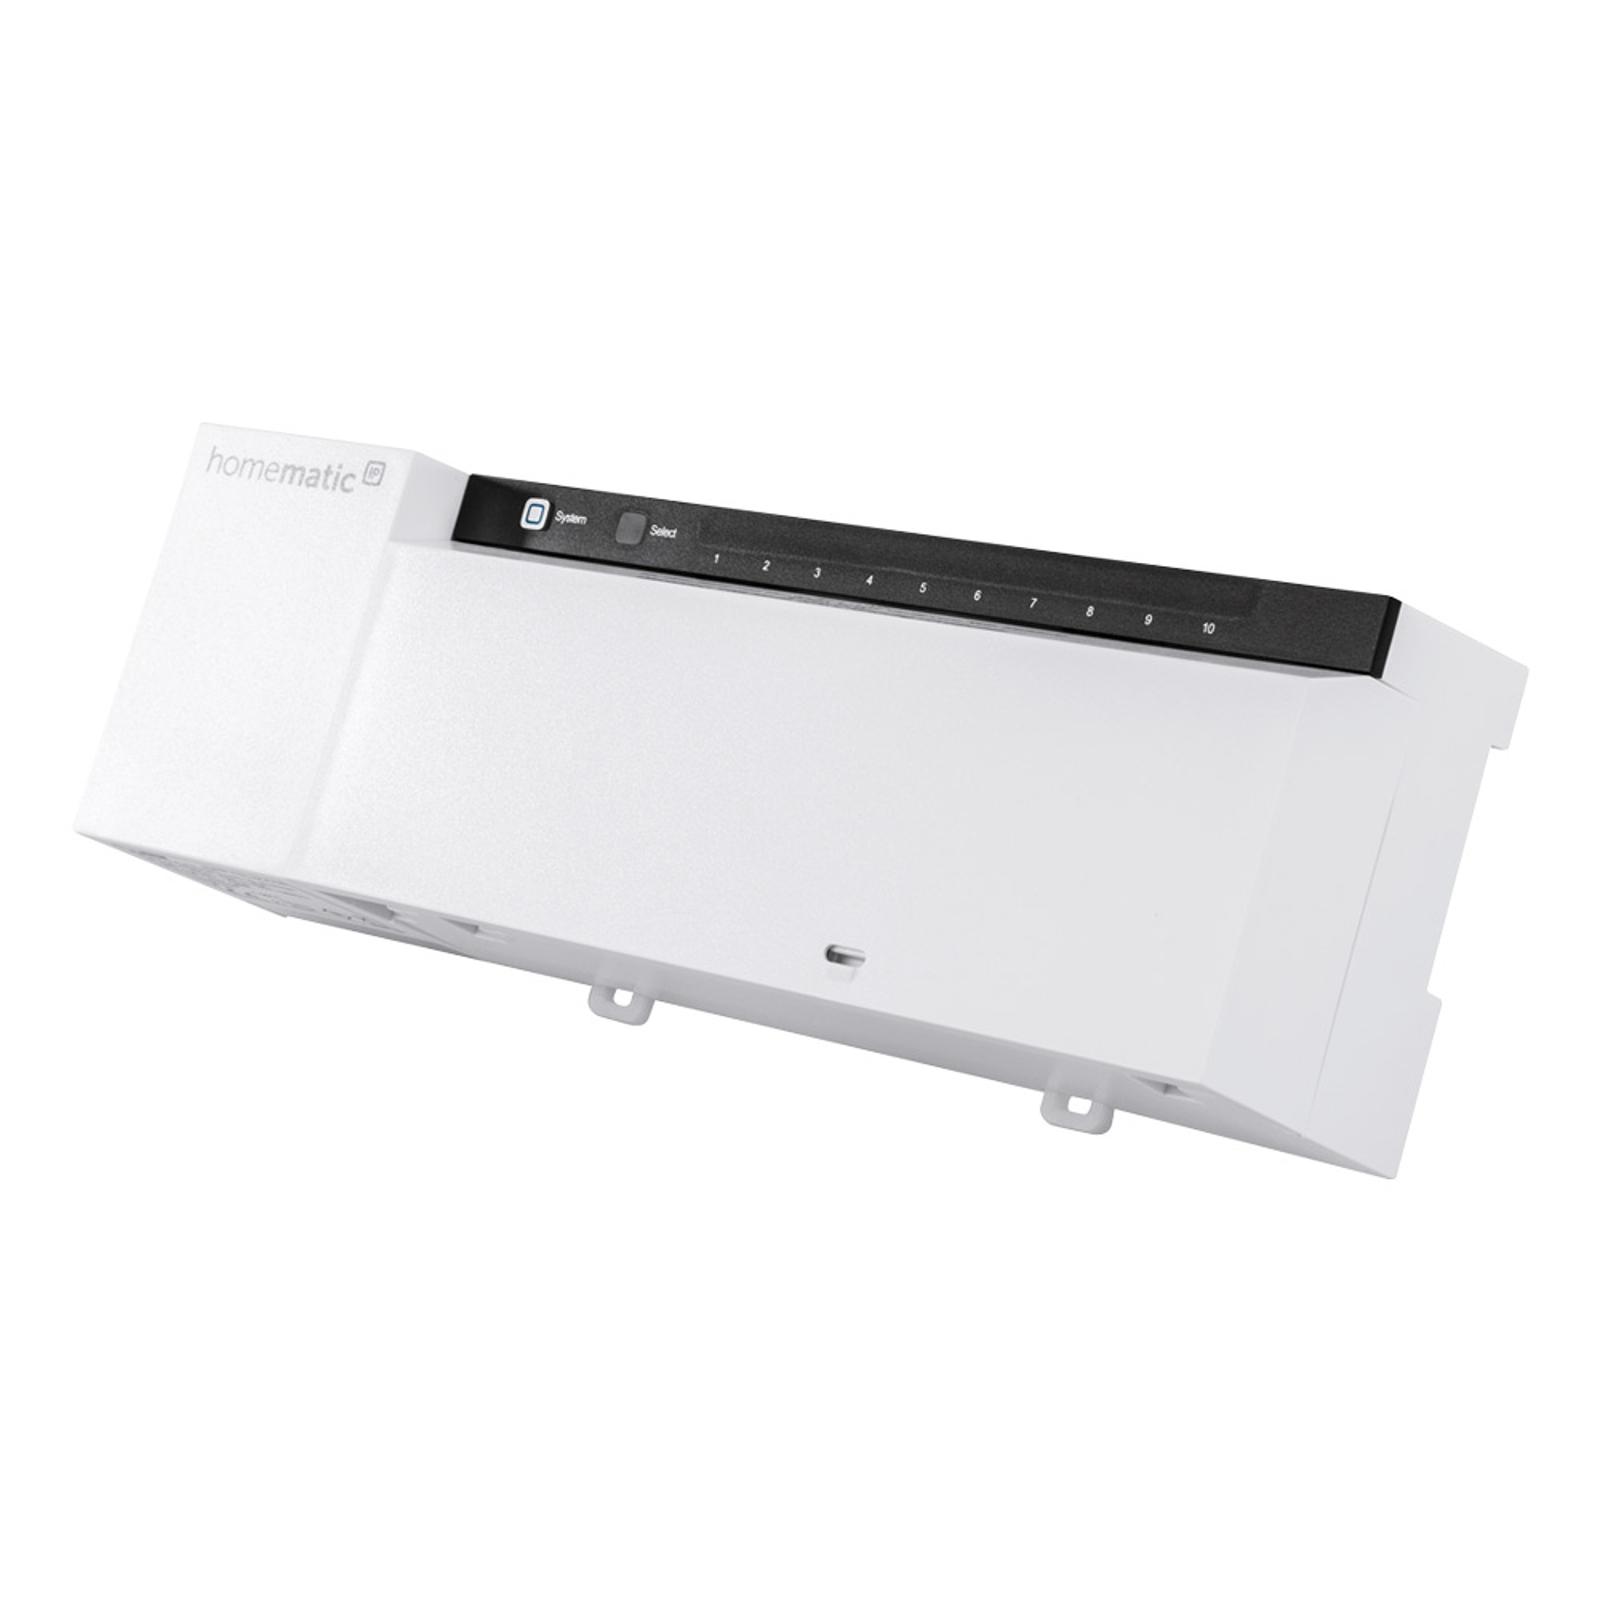 Homematic IP-vloerverwarmingsactuator, 10x, 24 V